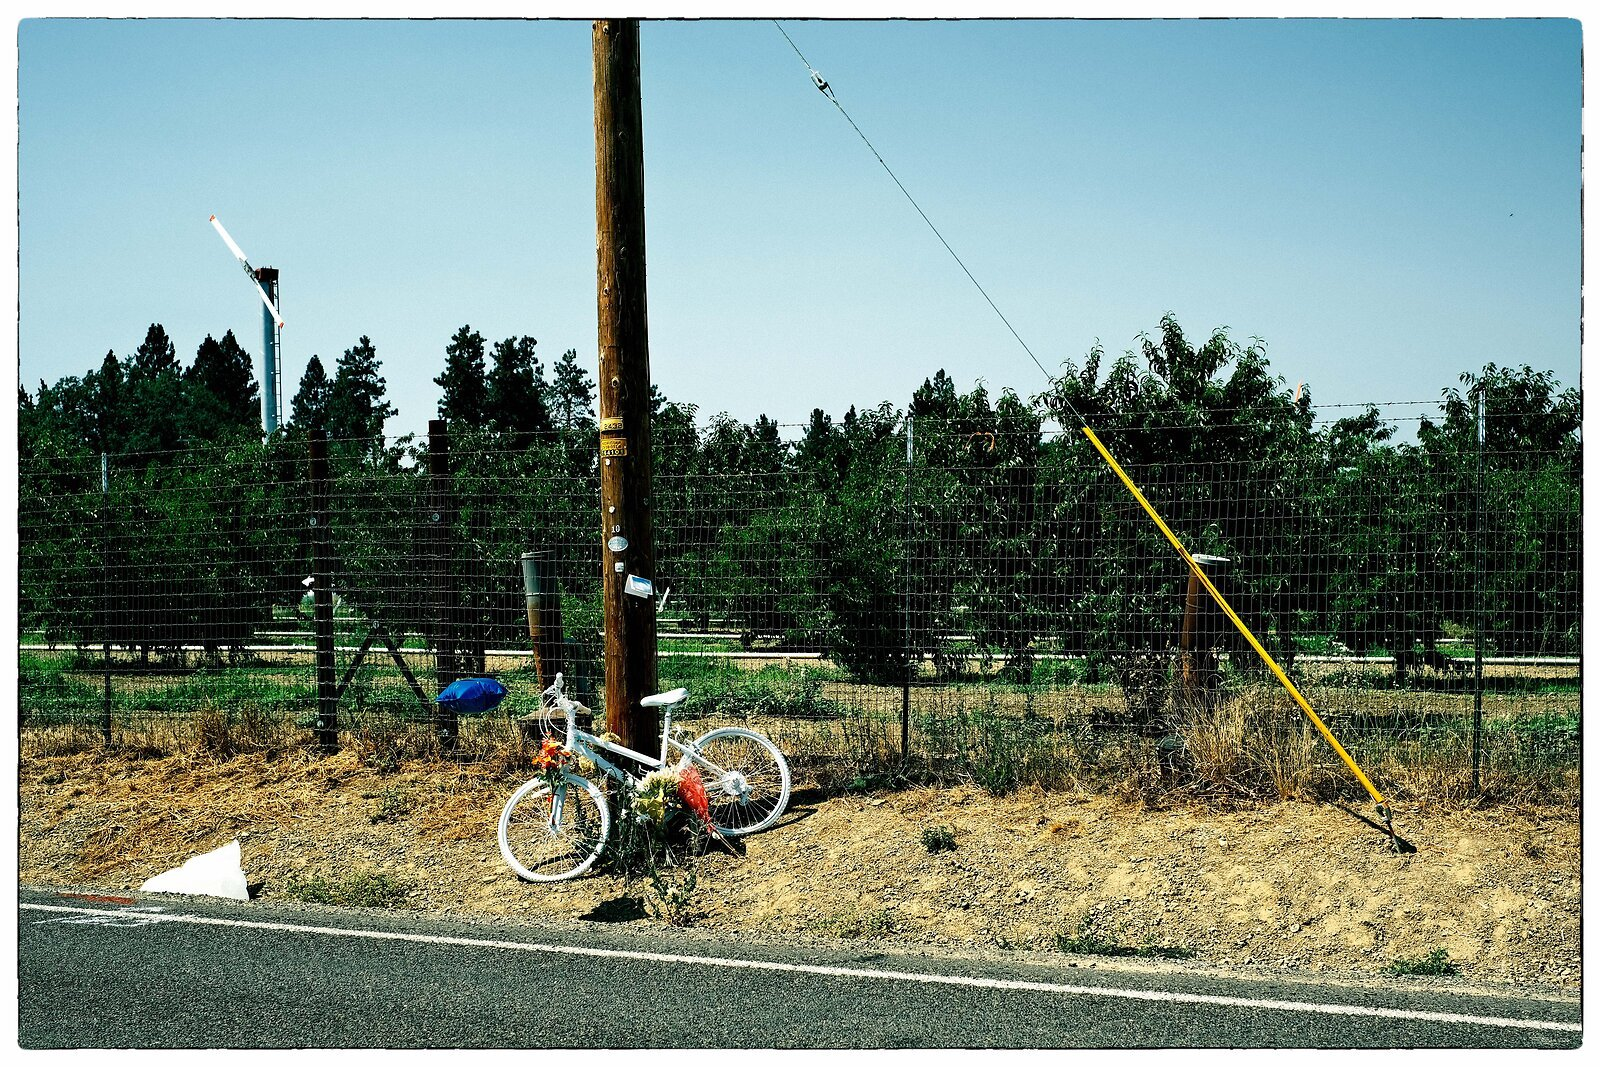 XPro3_July14_21_bicycle_memorial#5.jpg